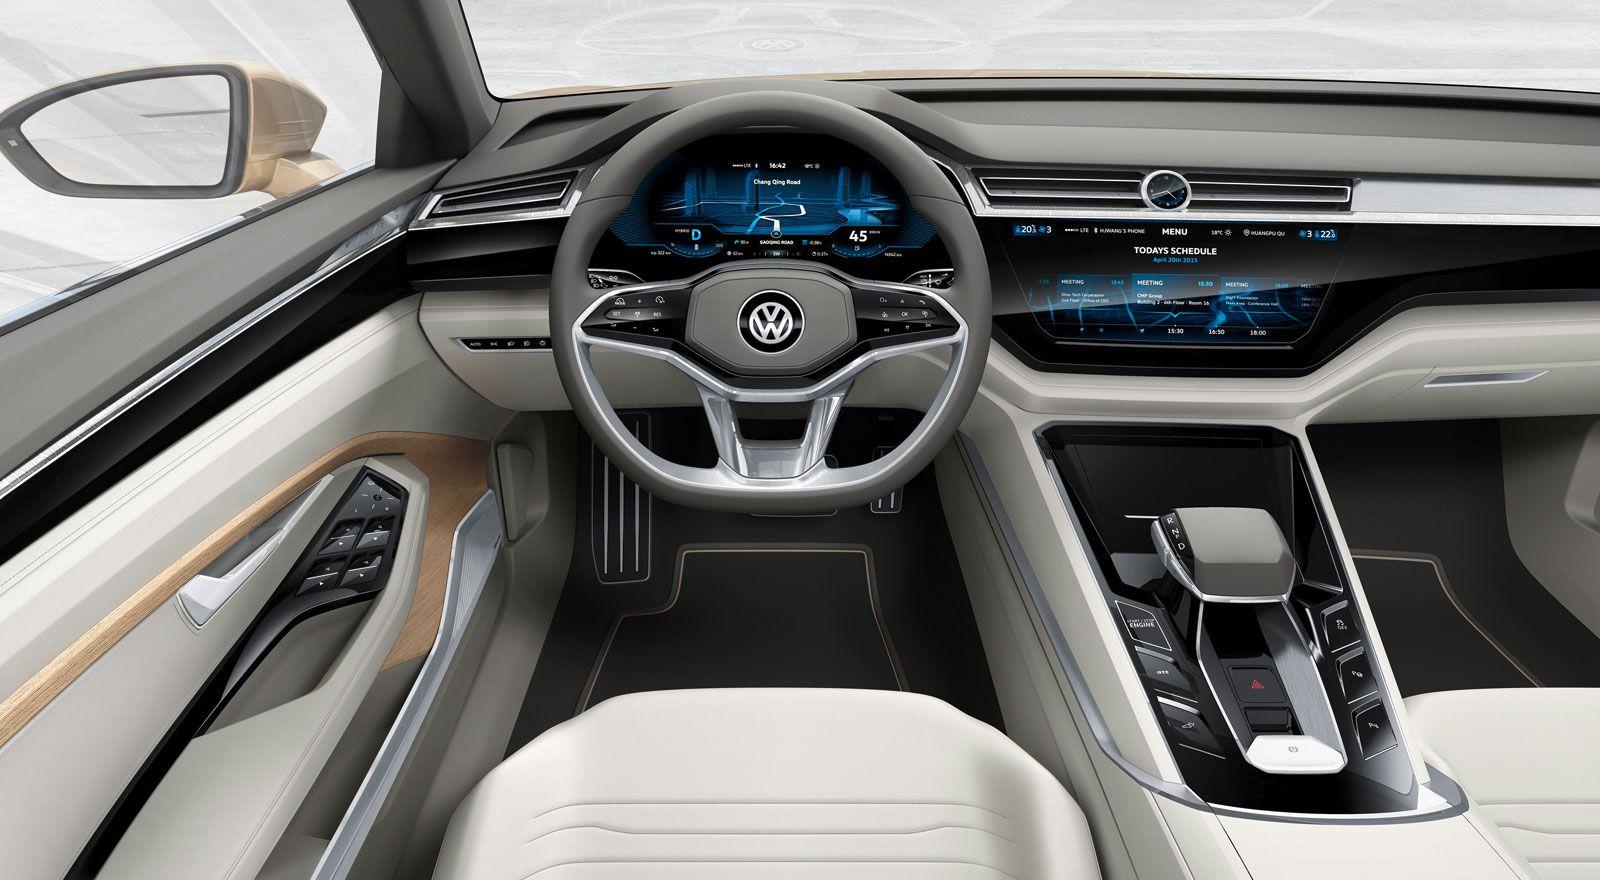 Volkswagen C Coupe Gte Concept Interior Render Volkswagen Phaeton Vw Sharan Volkswagen Jetta